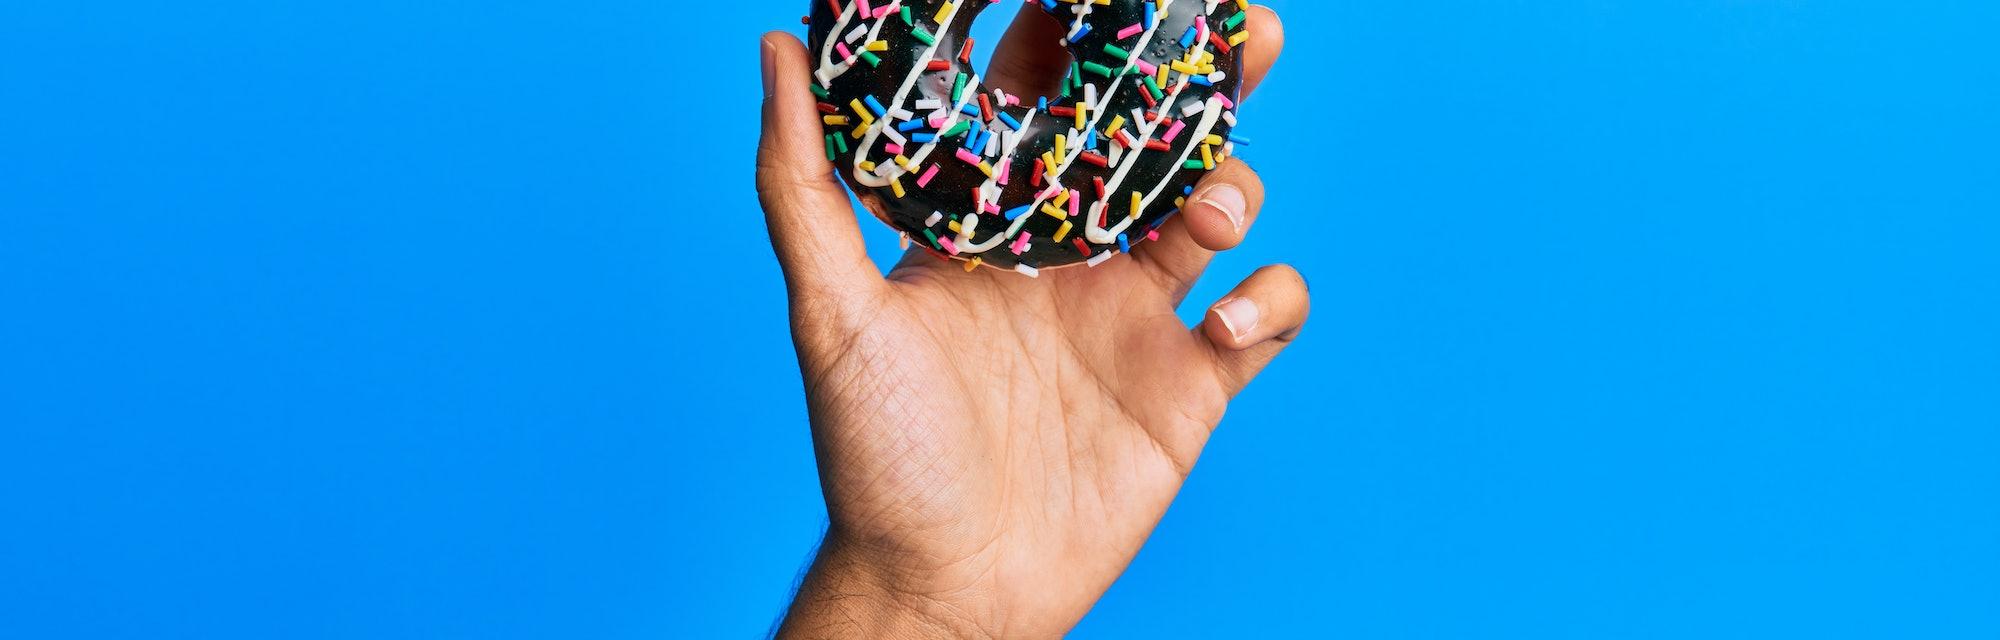 Hand of hispanic man holding chocolate donut over isolated blue background.